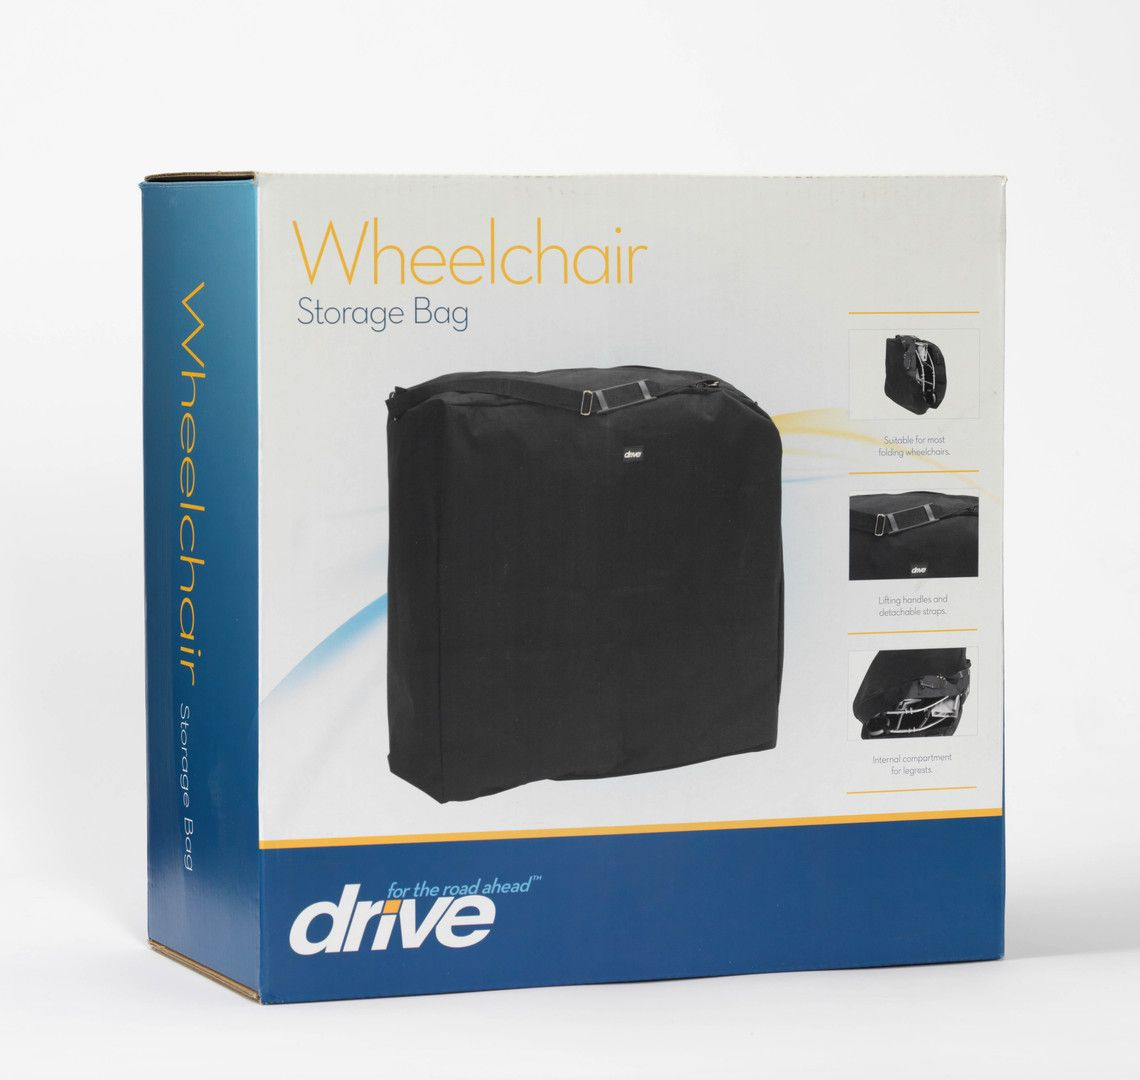 Drive Medical Wheelchair Storage Bag in Box